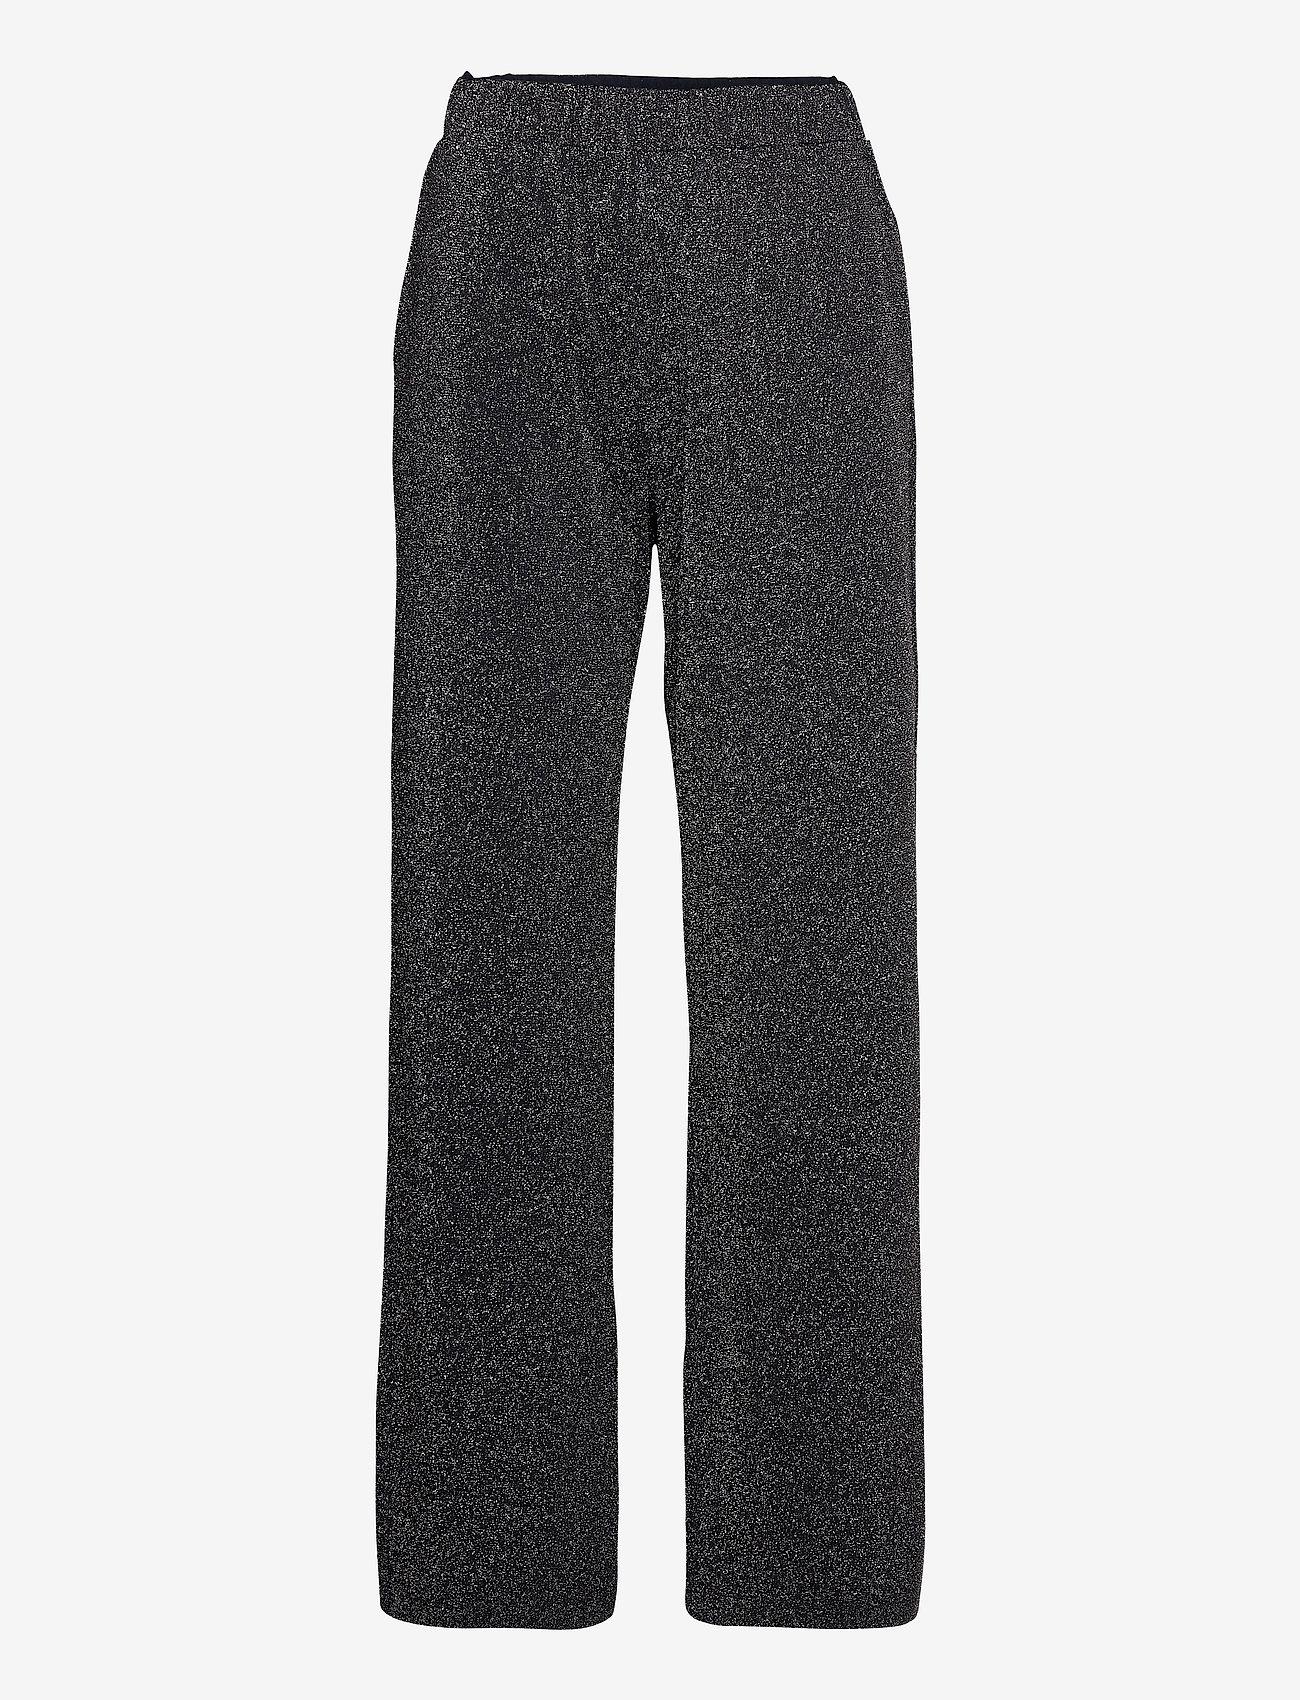 Max Mara Leisure - PALMIRA - wide leg trousers - navy - 0